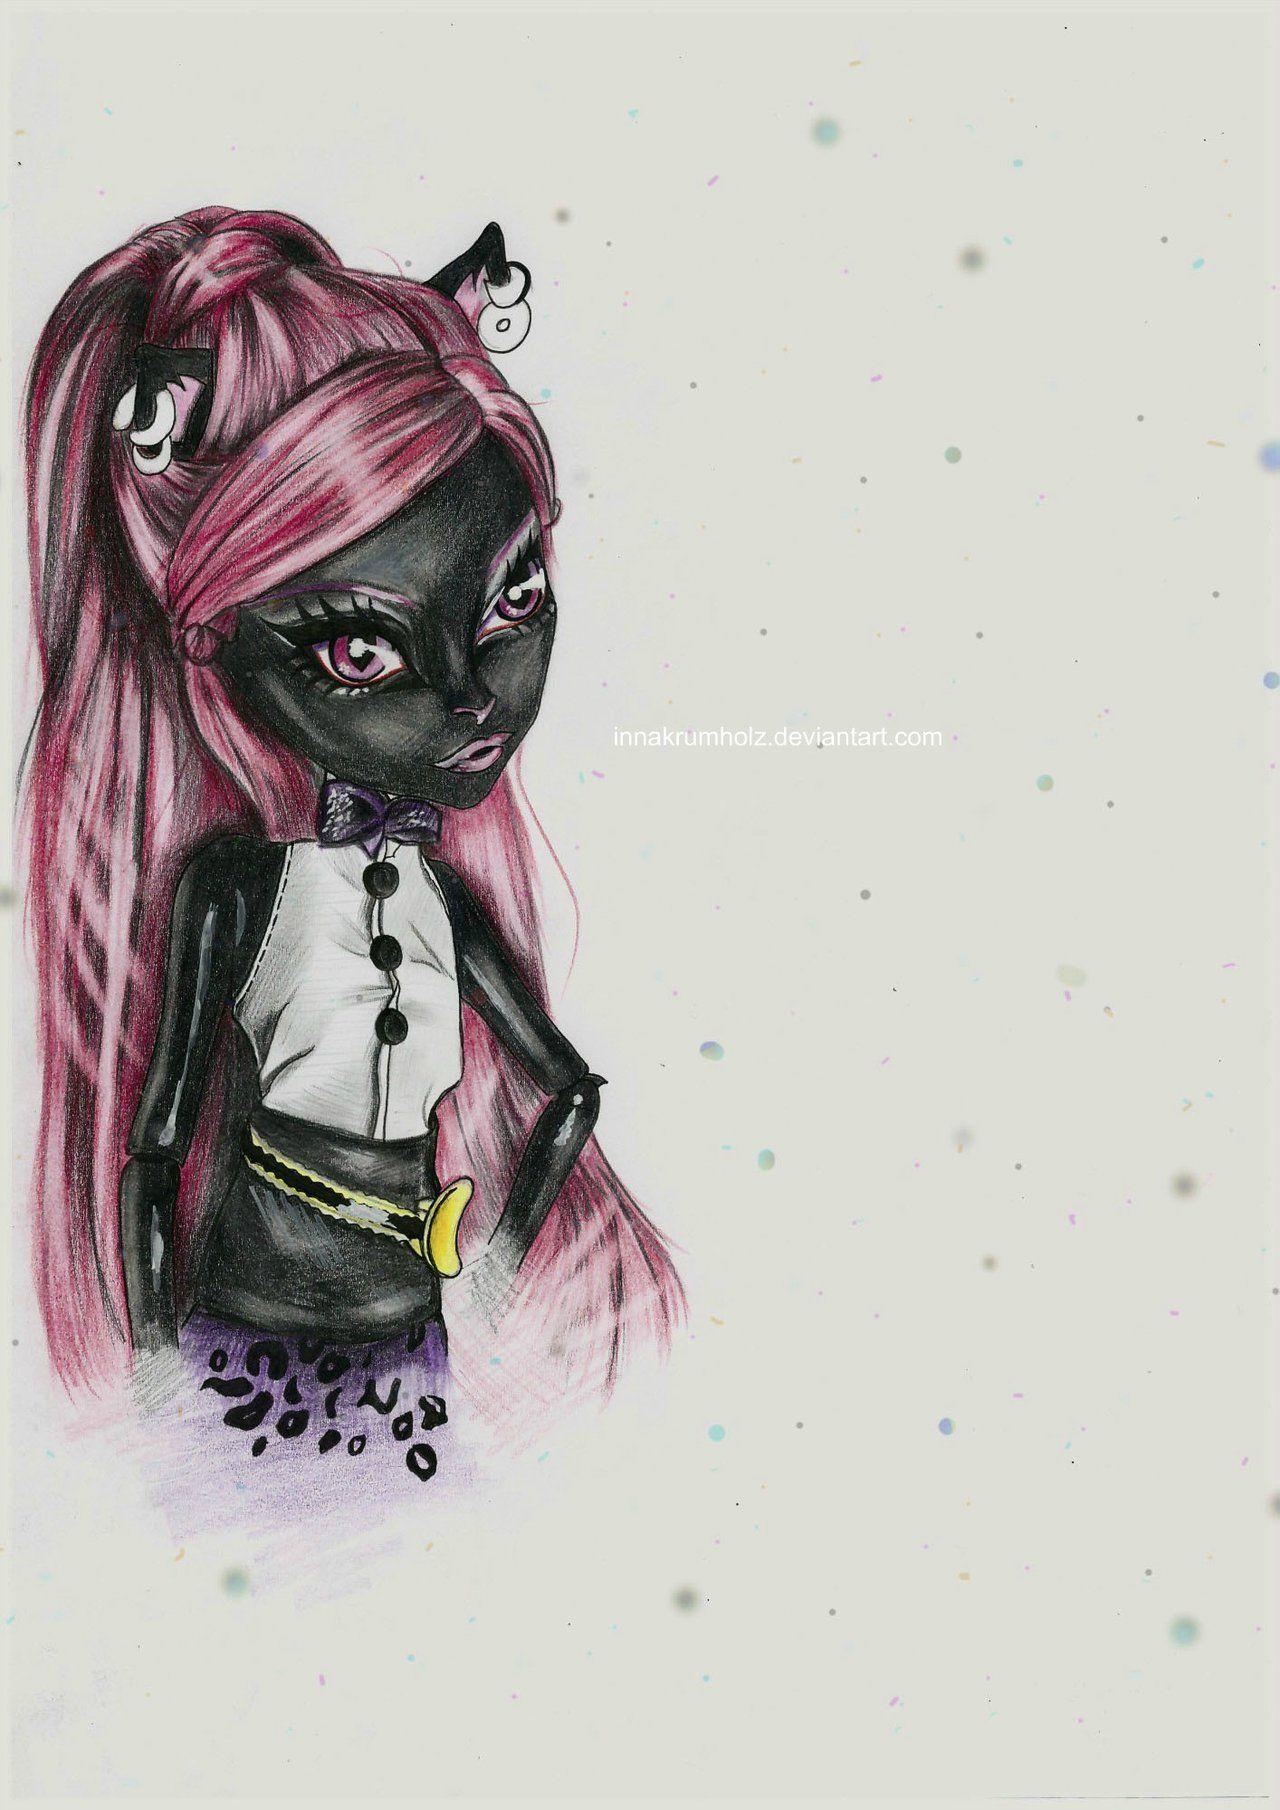 Catty Noir by Inna Krumholz / InnaKrumholz